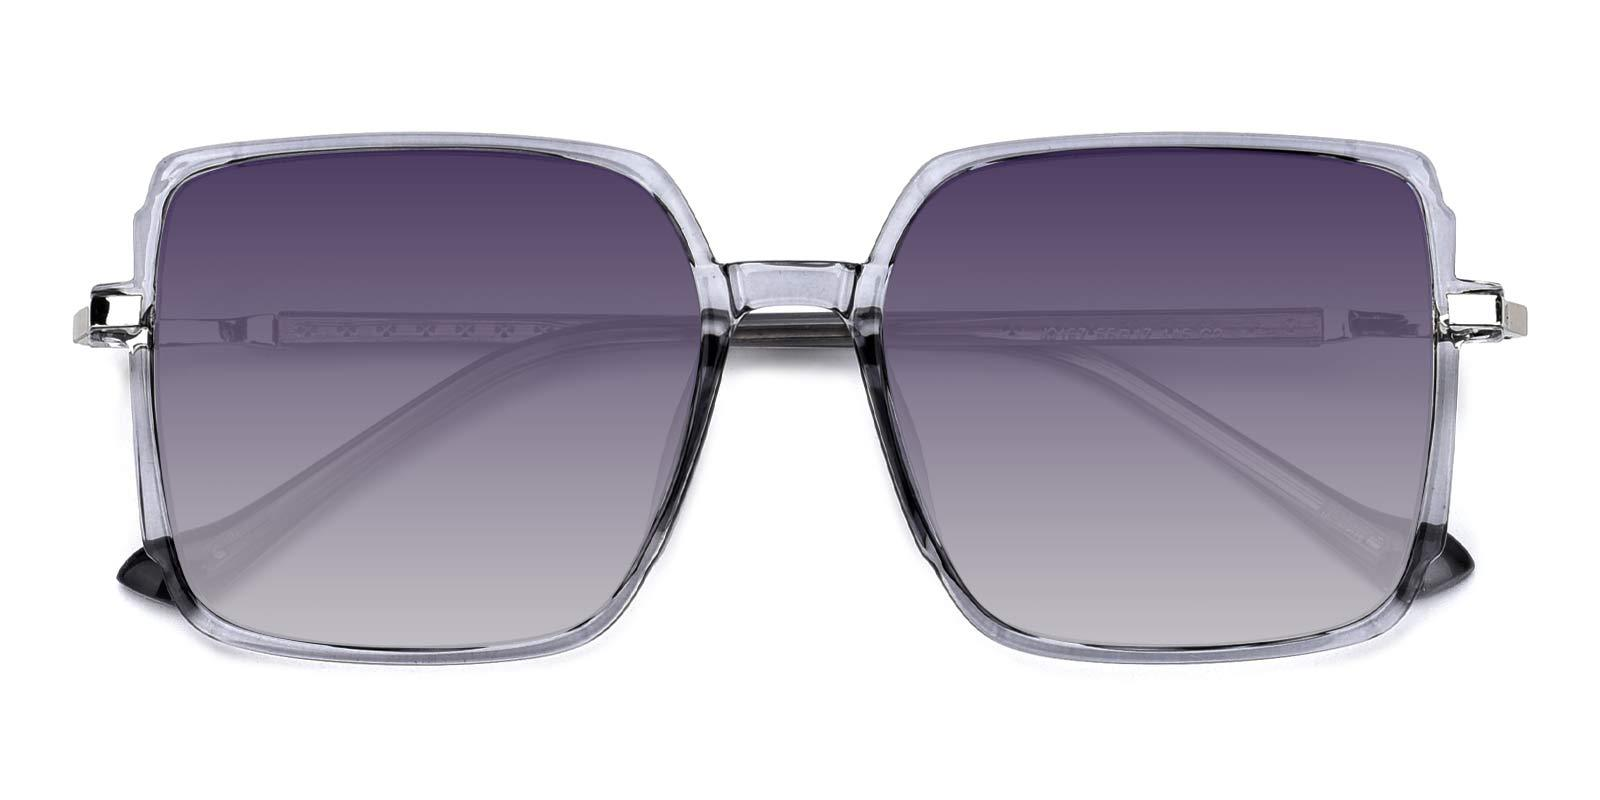 Pearl-Gray-Square-TR-Sunglasses-detail